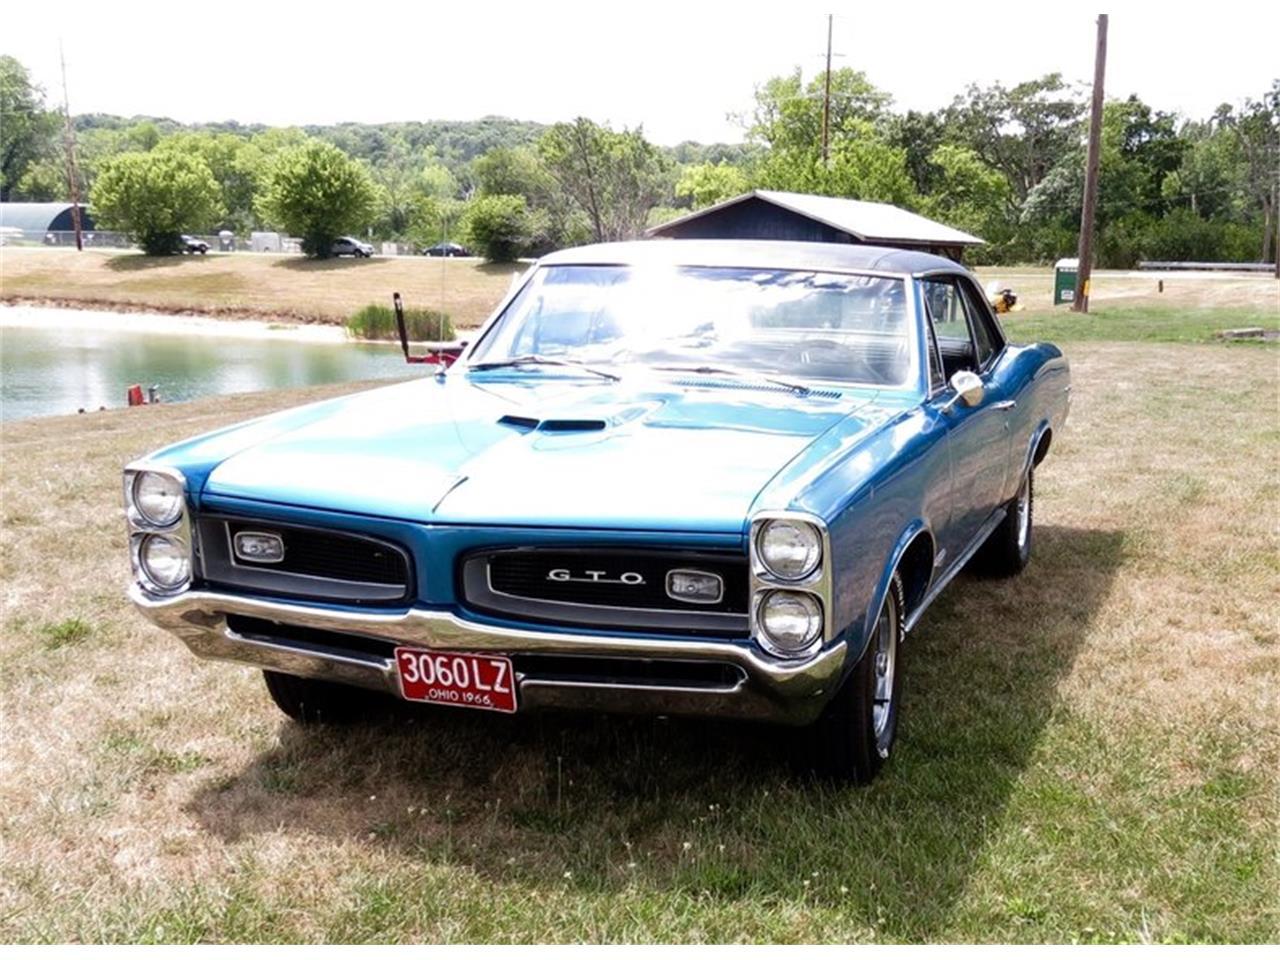 Продажа старых машин американцев